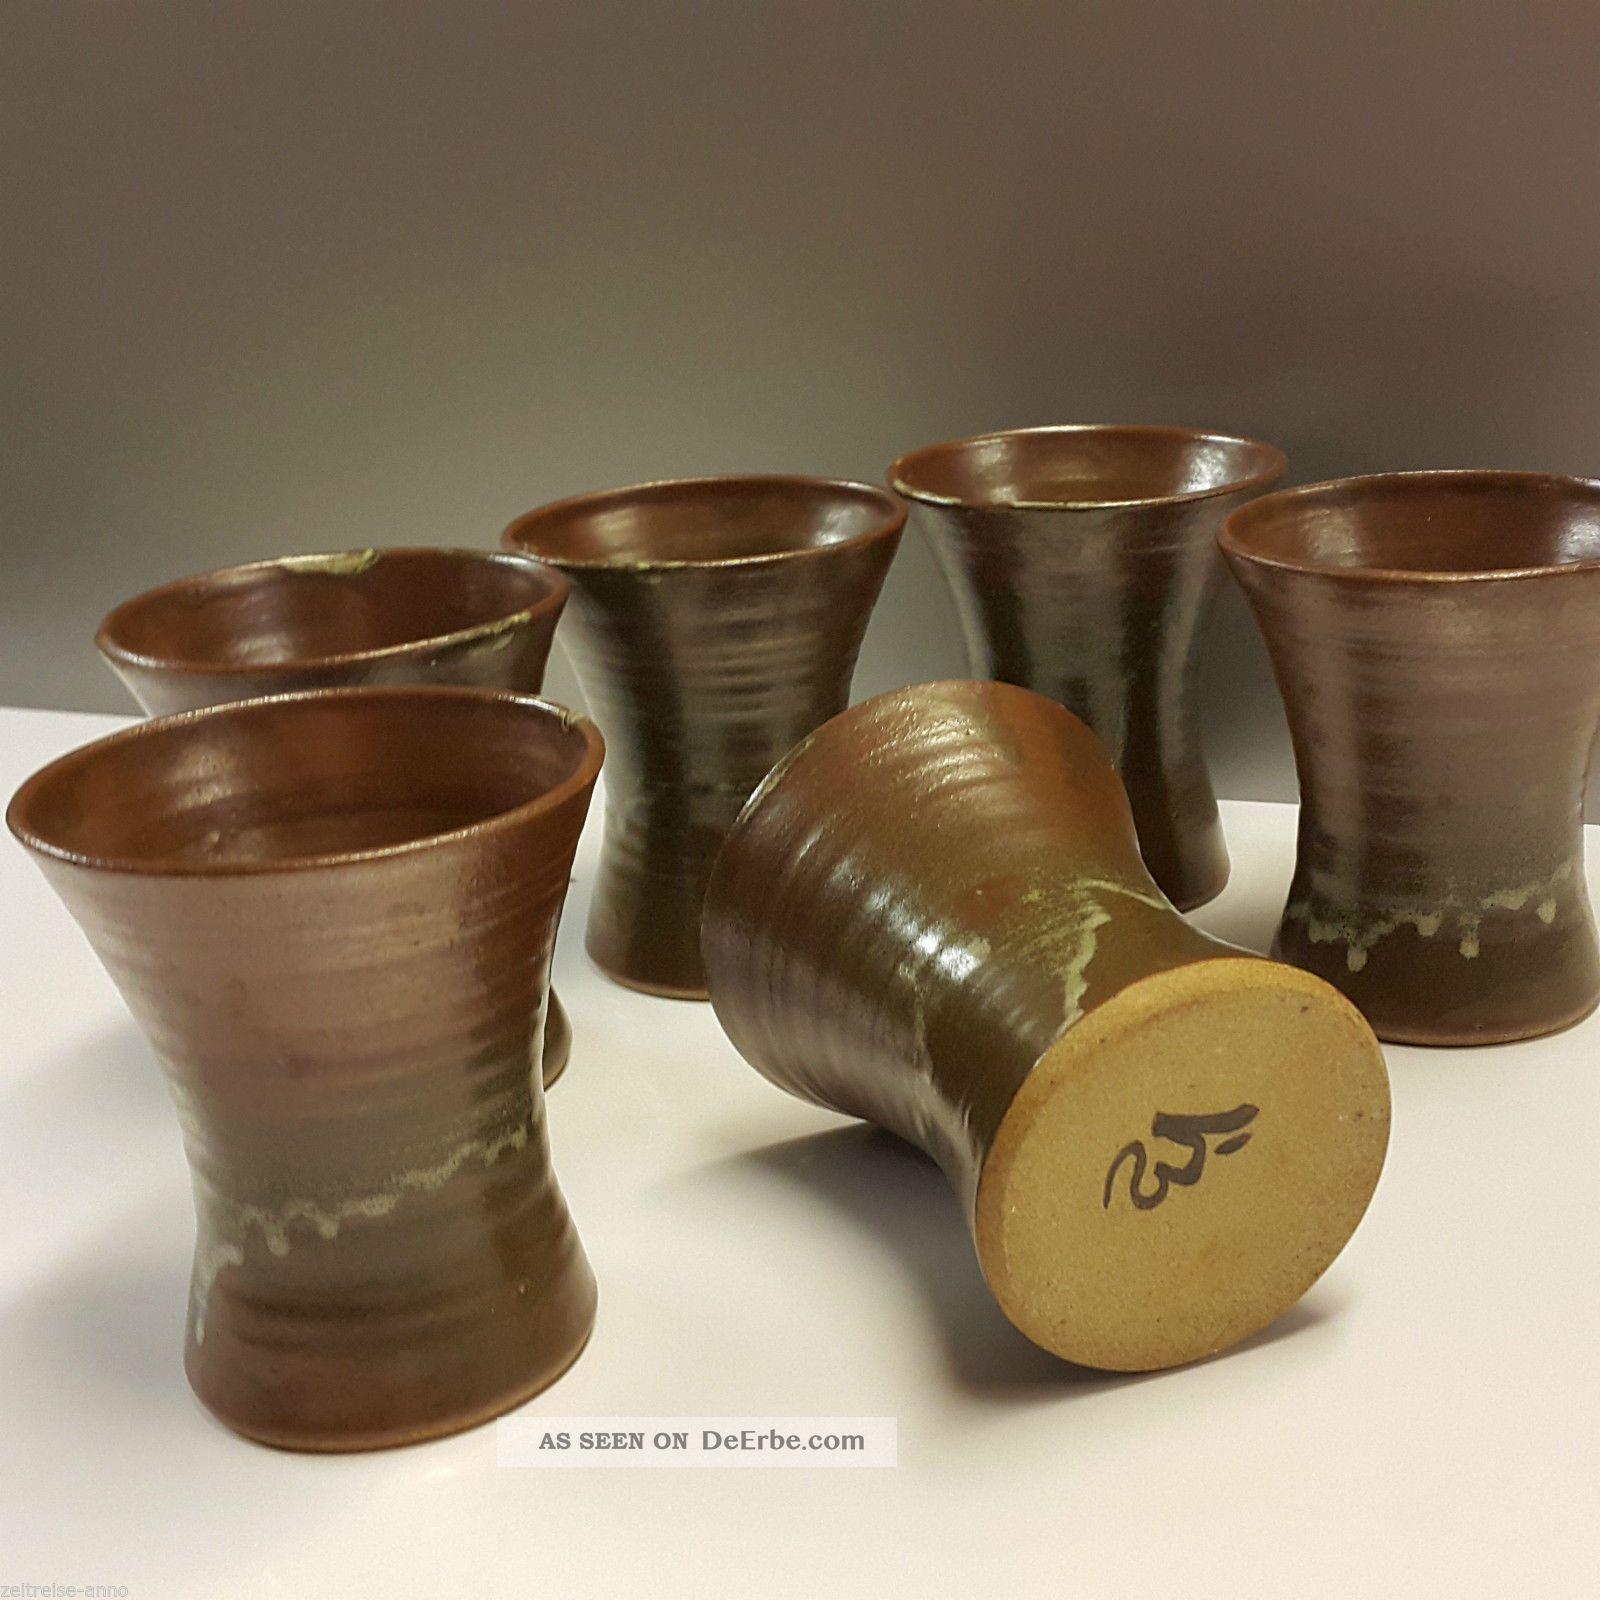 Rar Waistel Cooper Studio Keramik Pottery 6 Becher Trinkbecher Laufglasur Sign. Nach Marke & Herkunft Bild